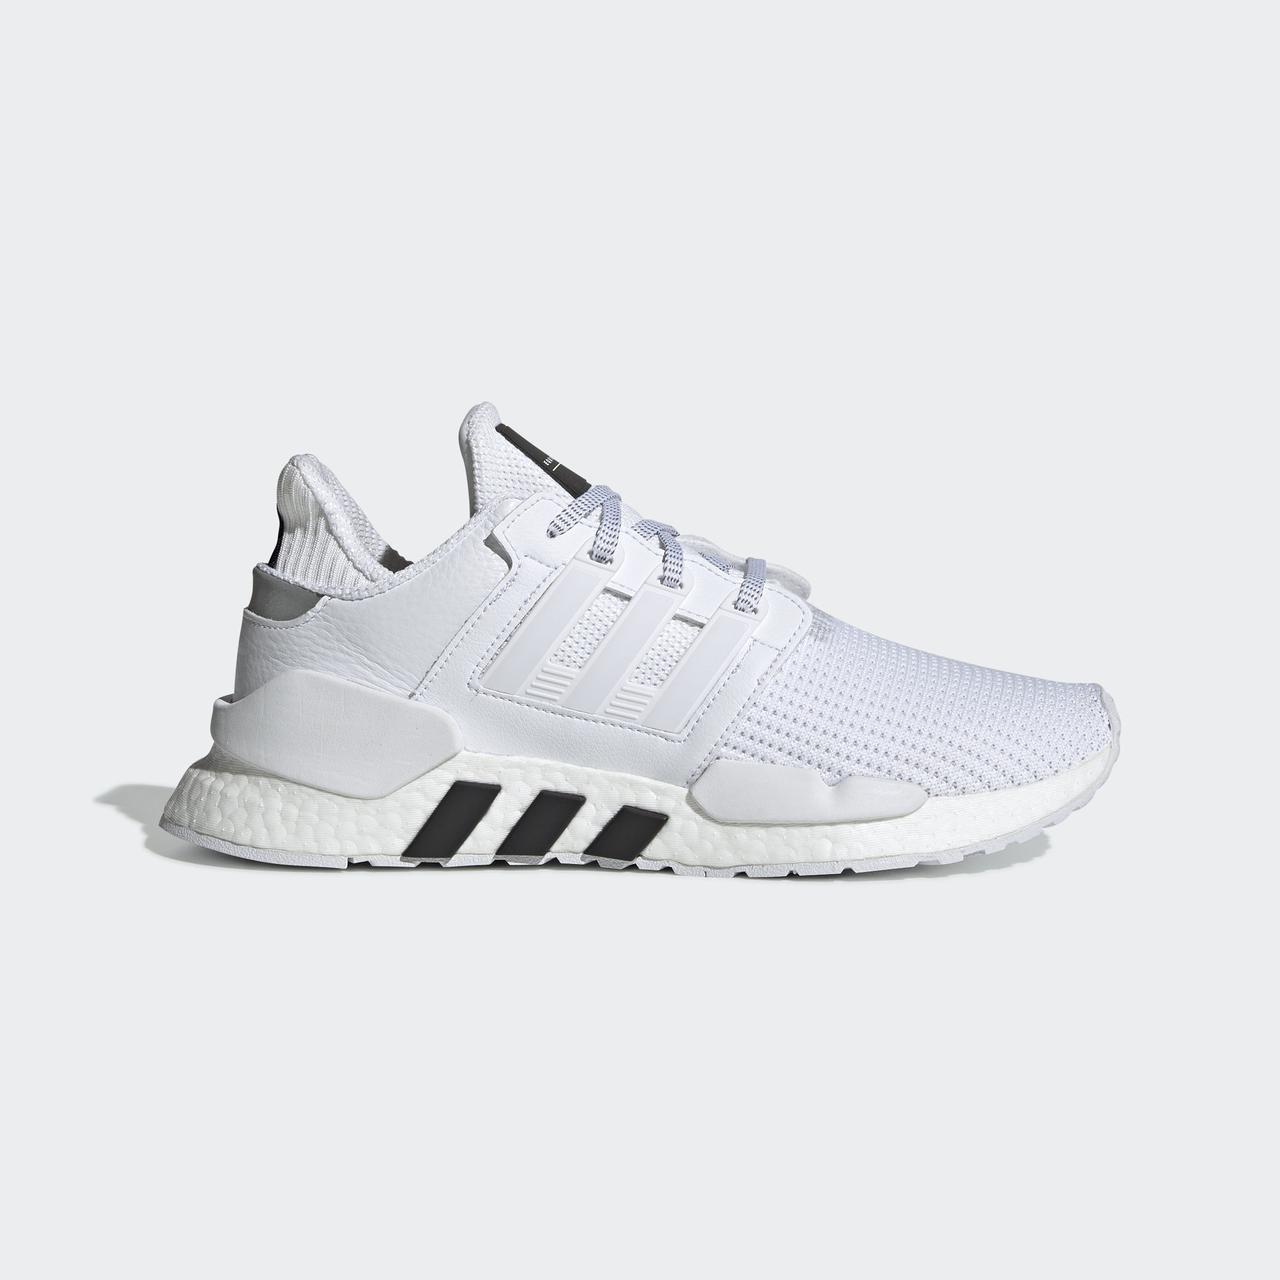 the latest 53cef 21d99 Кроссовки мужские Adidas EQT Support 91/18 BD7792 - 2019